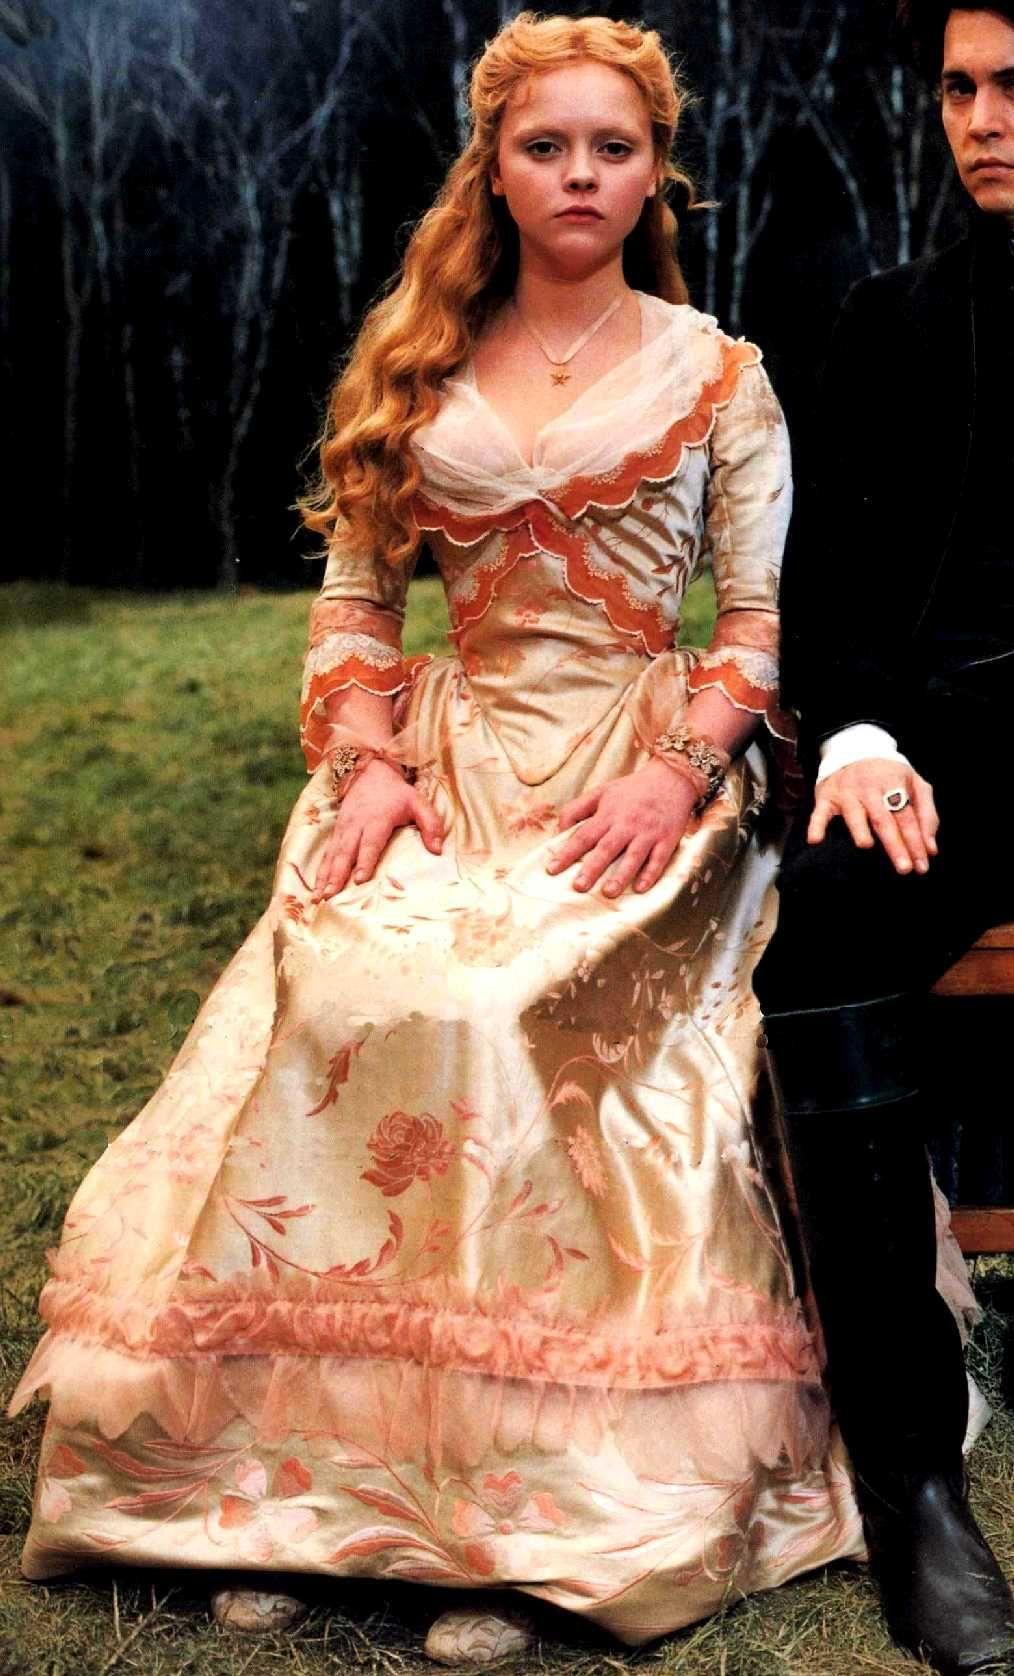 christina ricci as katrina von tassel in sleepy hollow